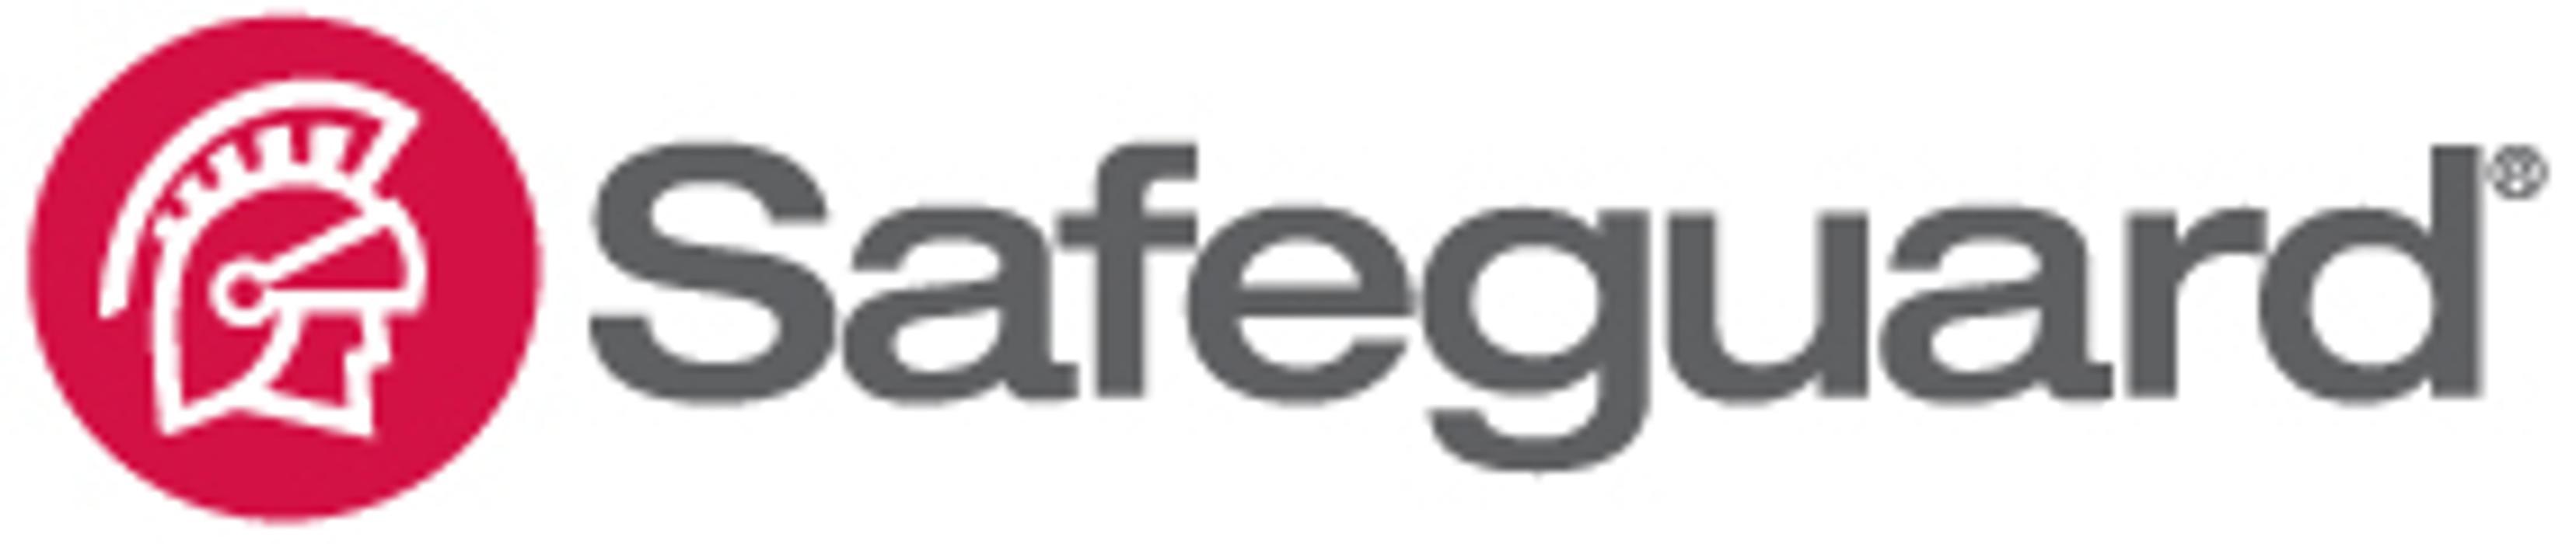 Paul Tauro - Marketing Consultant, Safeguard Business Systems - Leonia, NJ